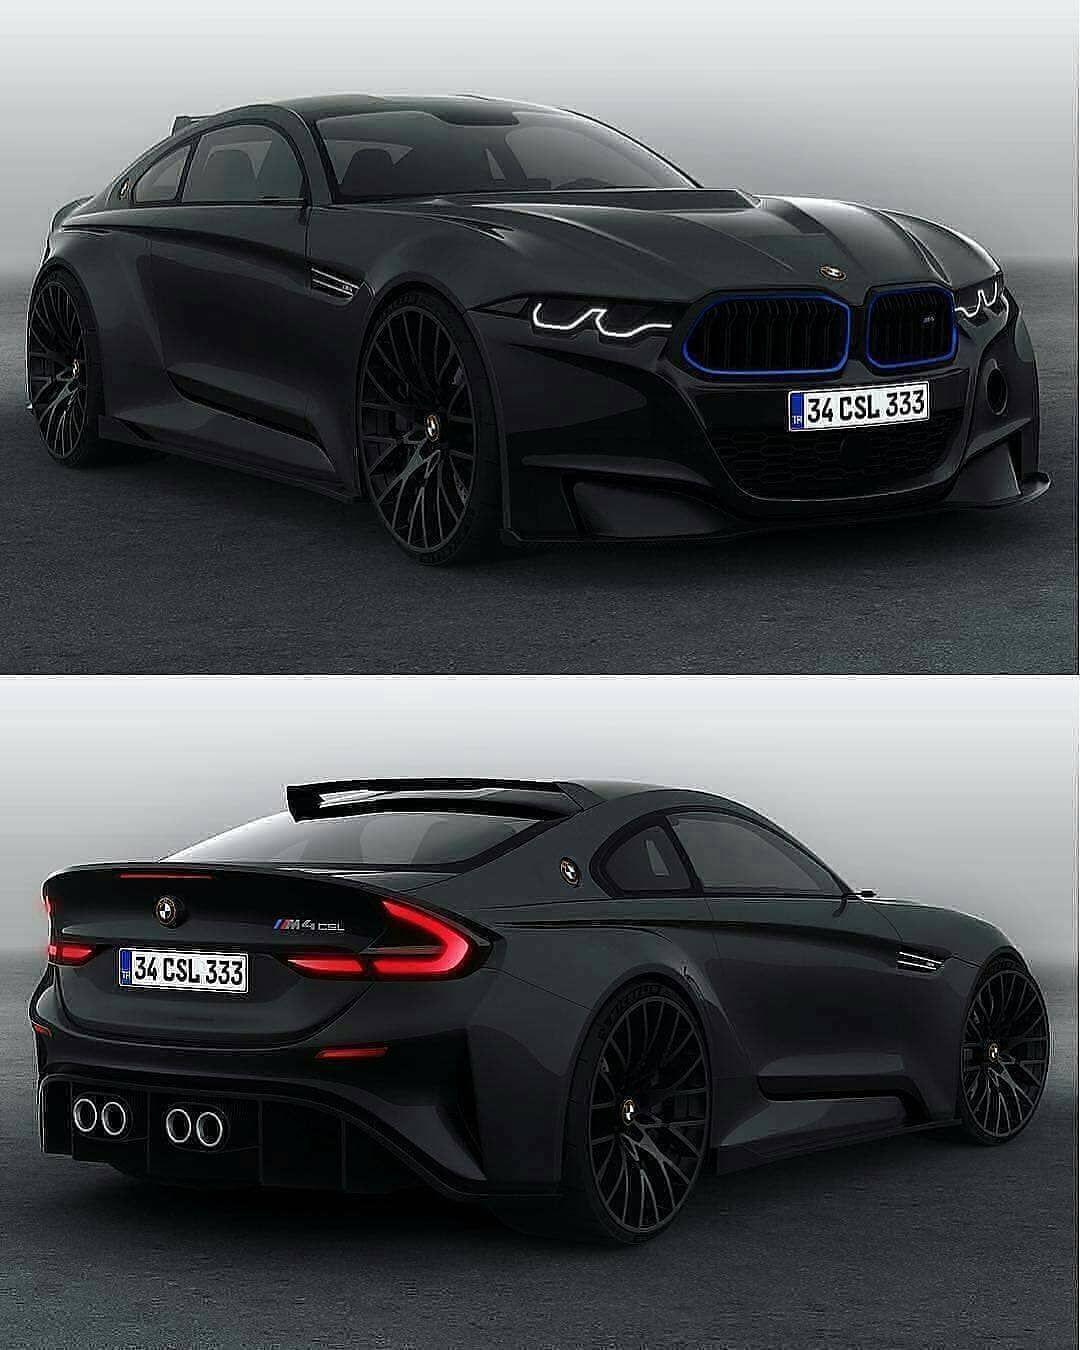 "bodybuilding & fitness on Instagram: ""BMW M4 Compact 😎😎😎 Follow @body.legendss . . .#cars #car #ferrari #carporn #like #carsofinstagram #speed #exoticcars #sportscar #supercars…"""